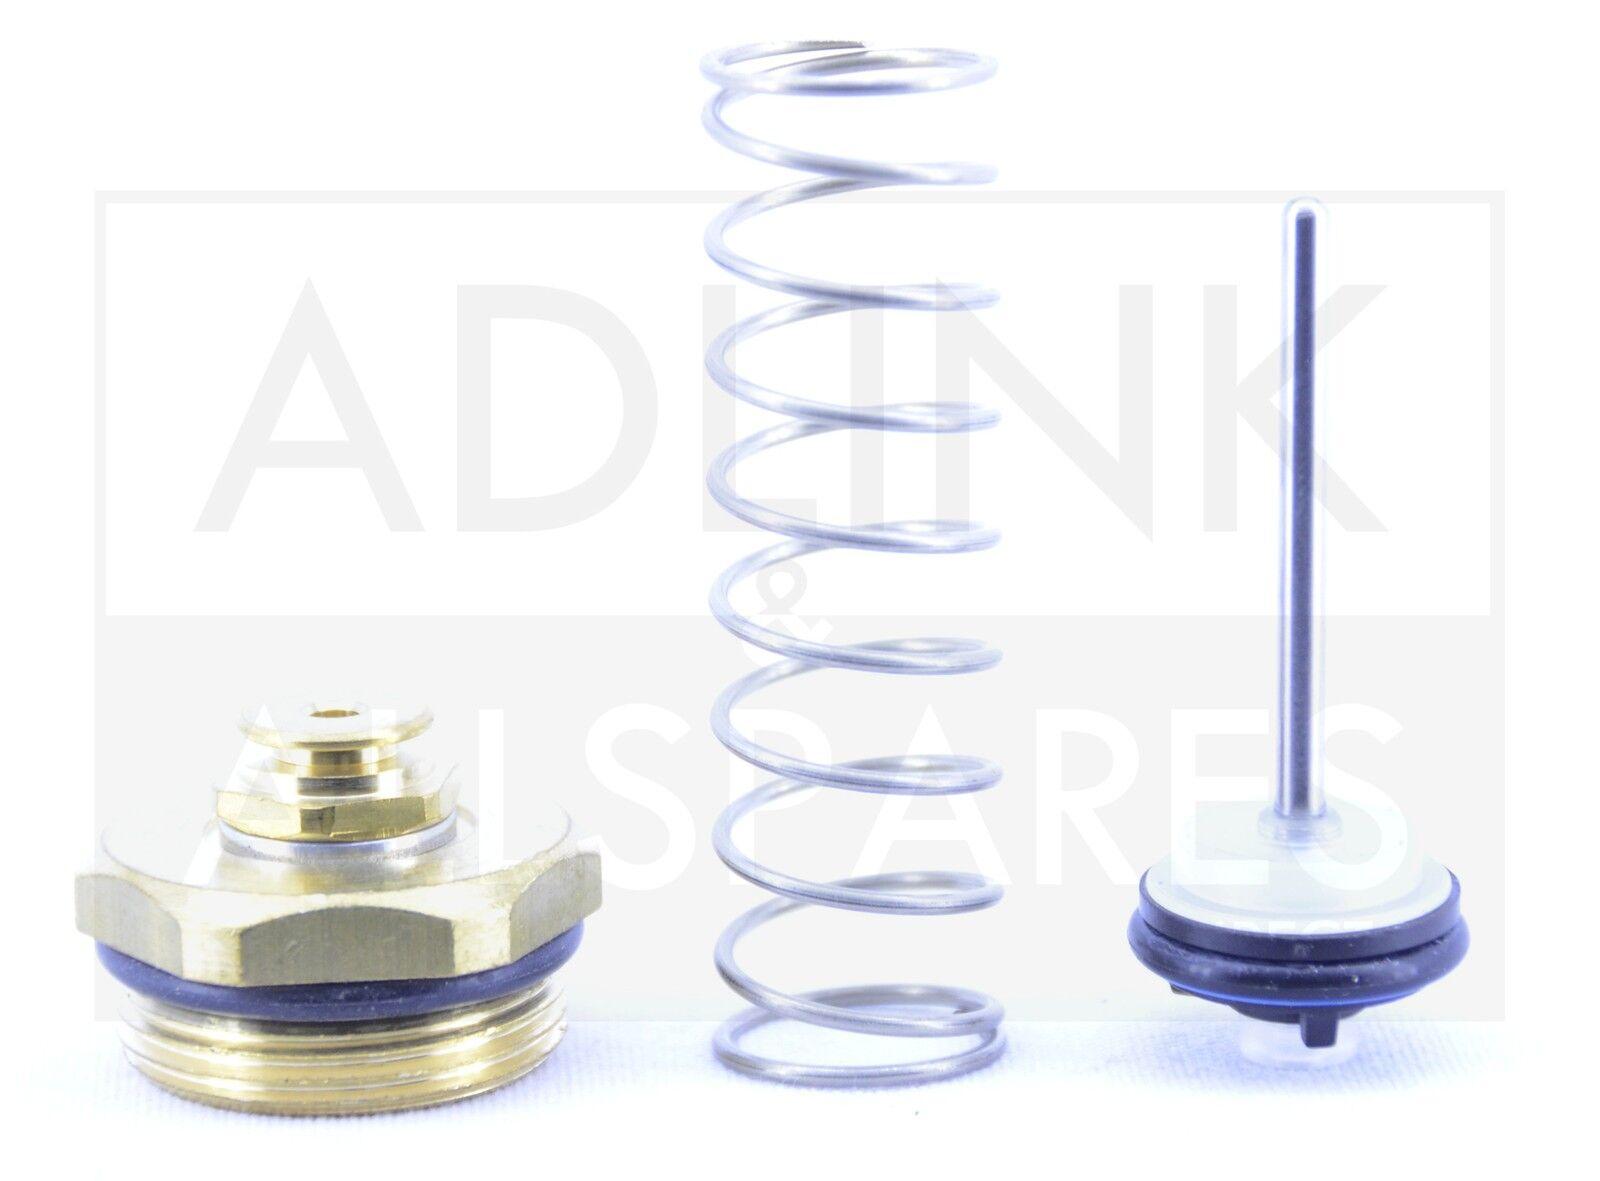 Ariston EuroCombi A23 mffi A27 A27 A27 mffi agua caliente doméstica Interruptor de presión 571442 4c29d4